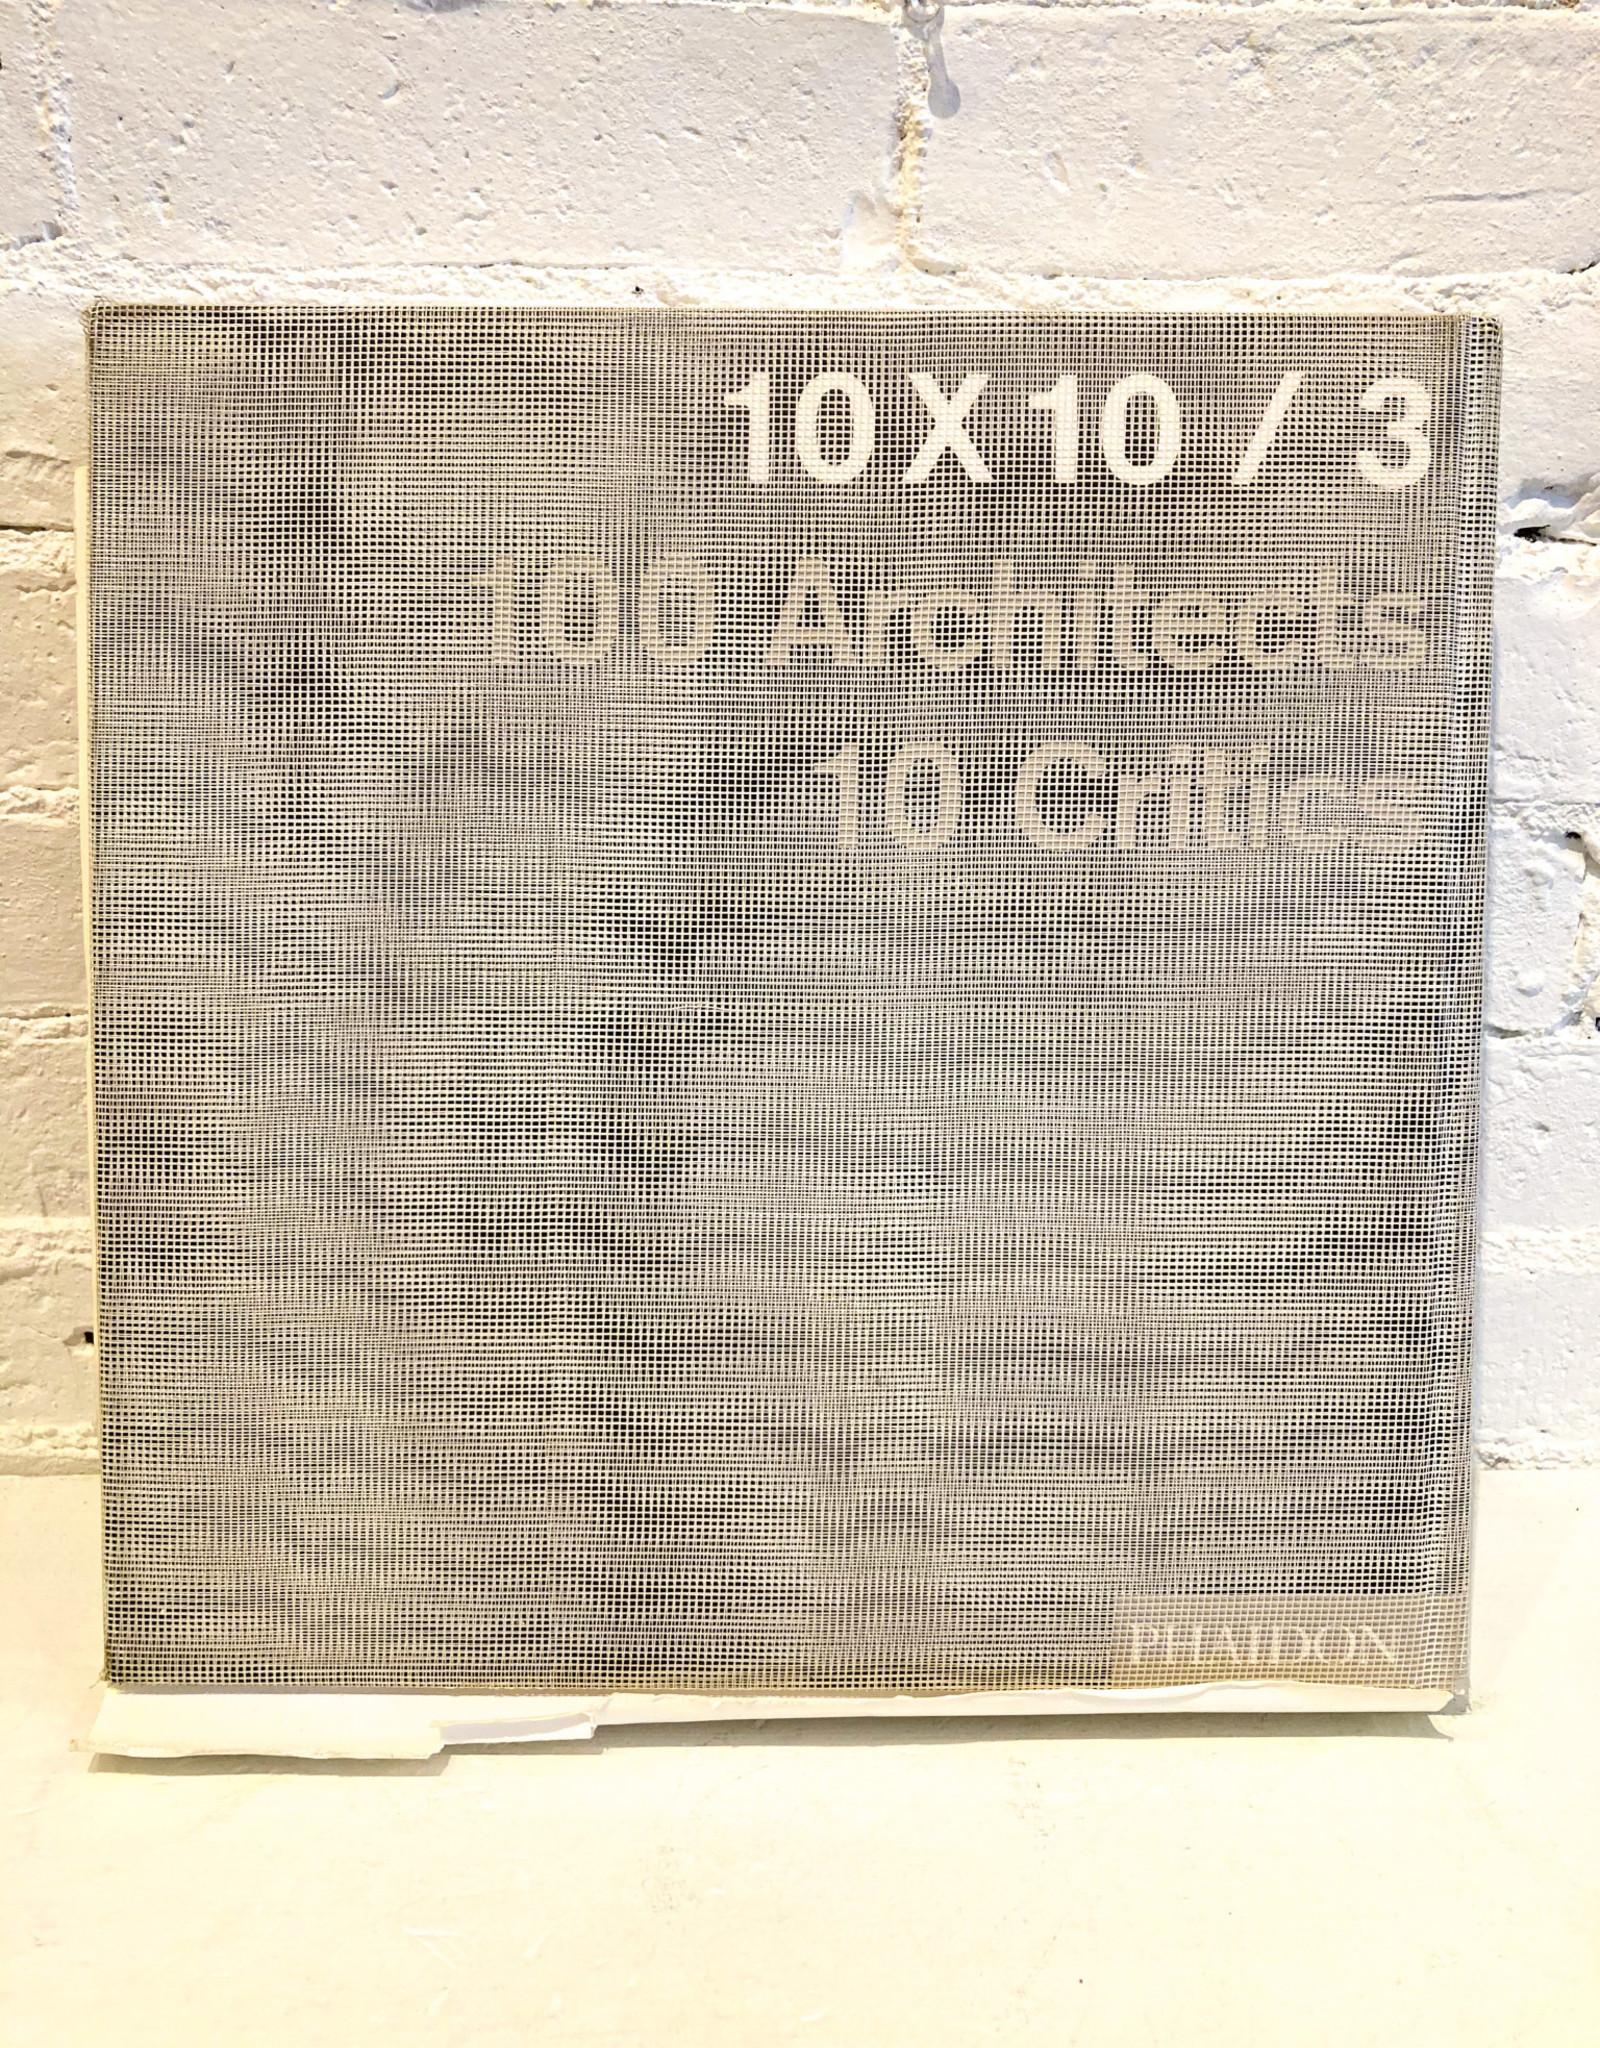 10 X 10 / 3: 100 Architects, 10 Critics